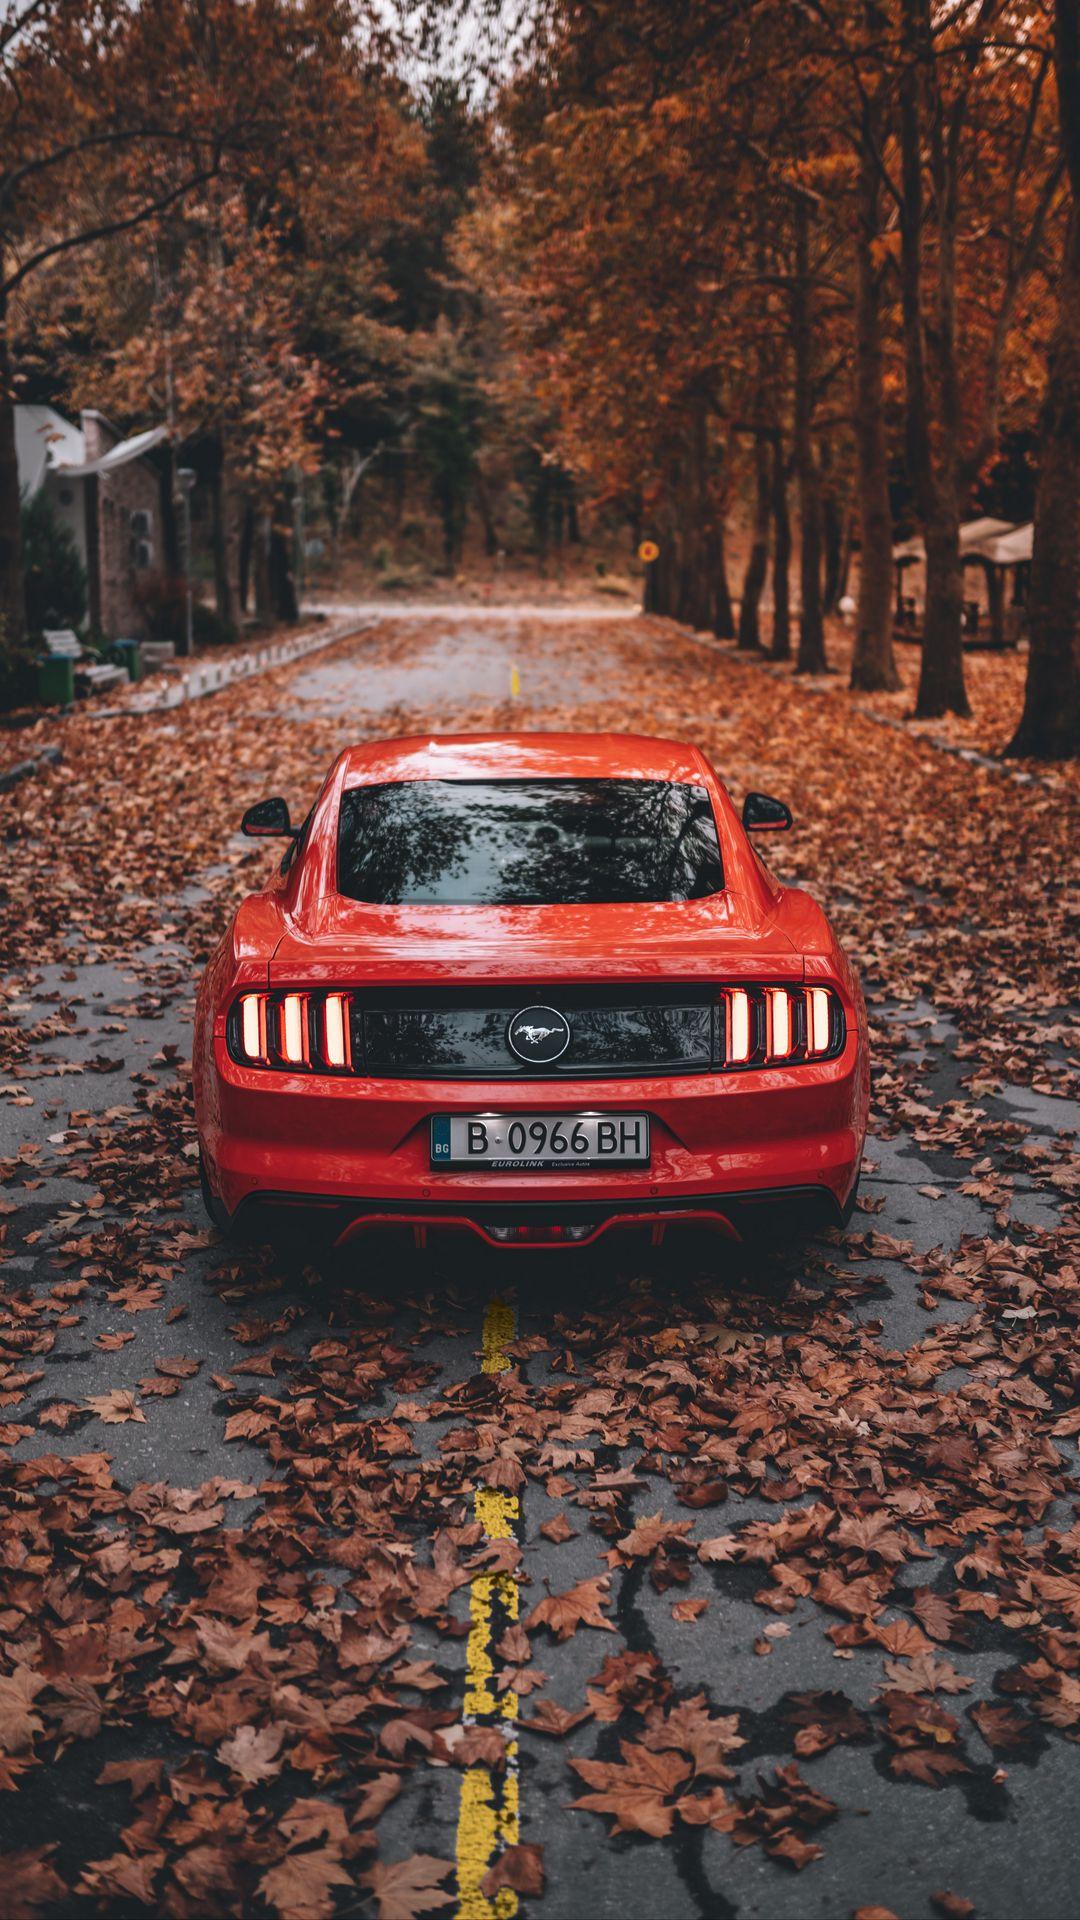 Orange Ford Mustang Car Wallpapers Free Download